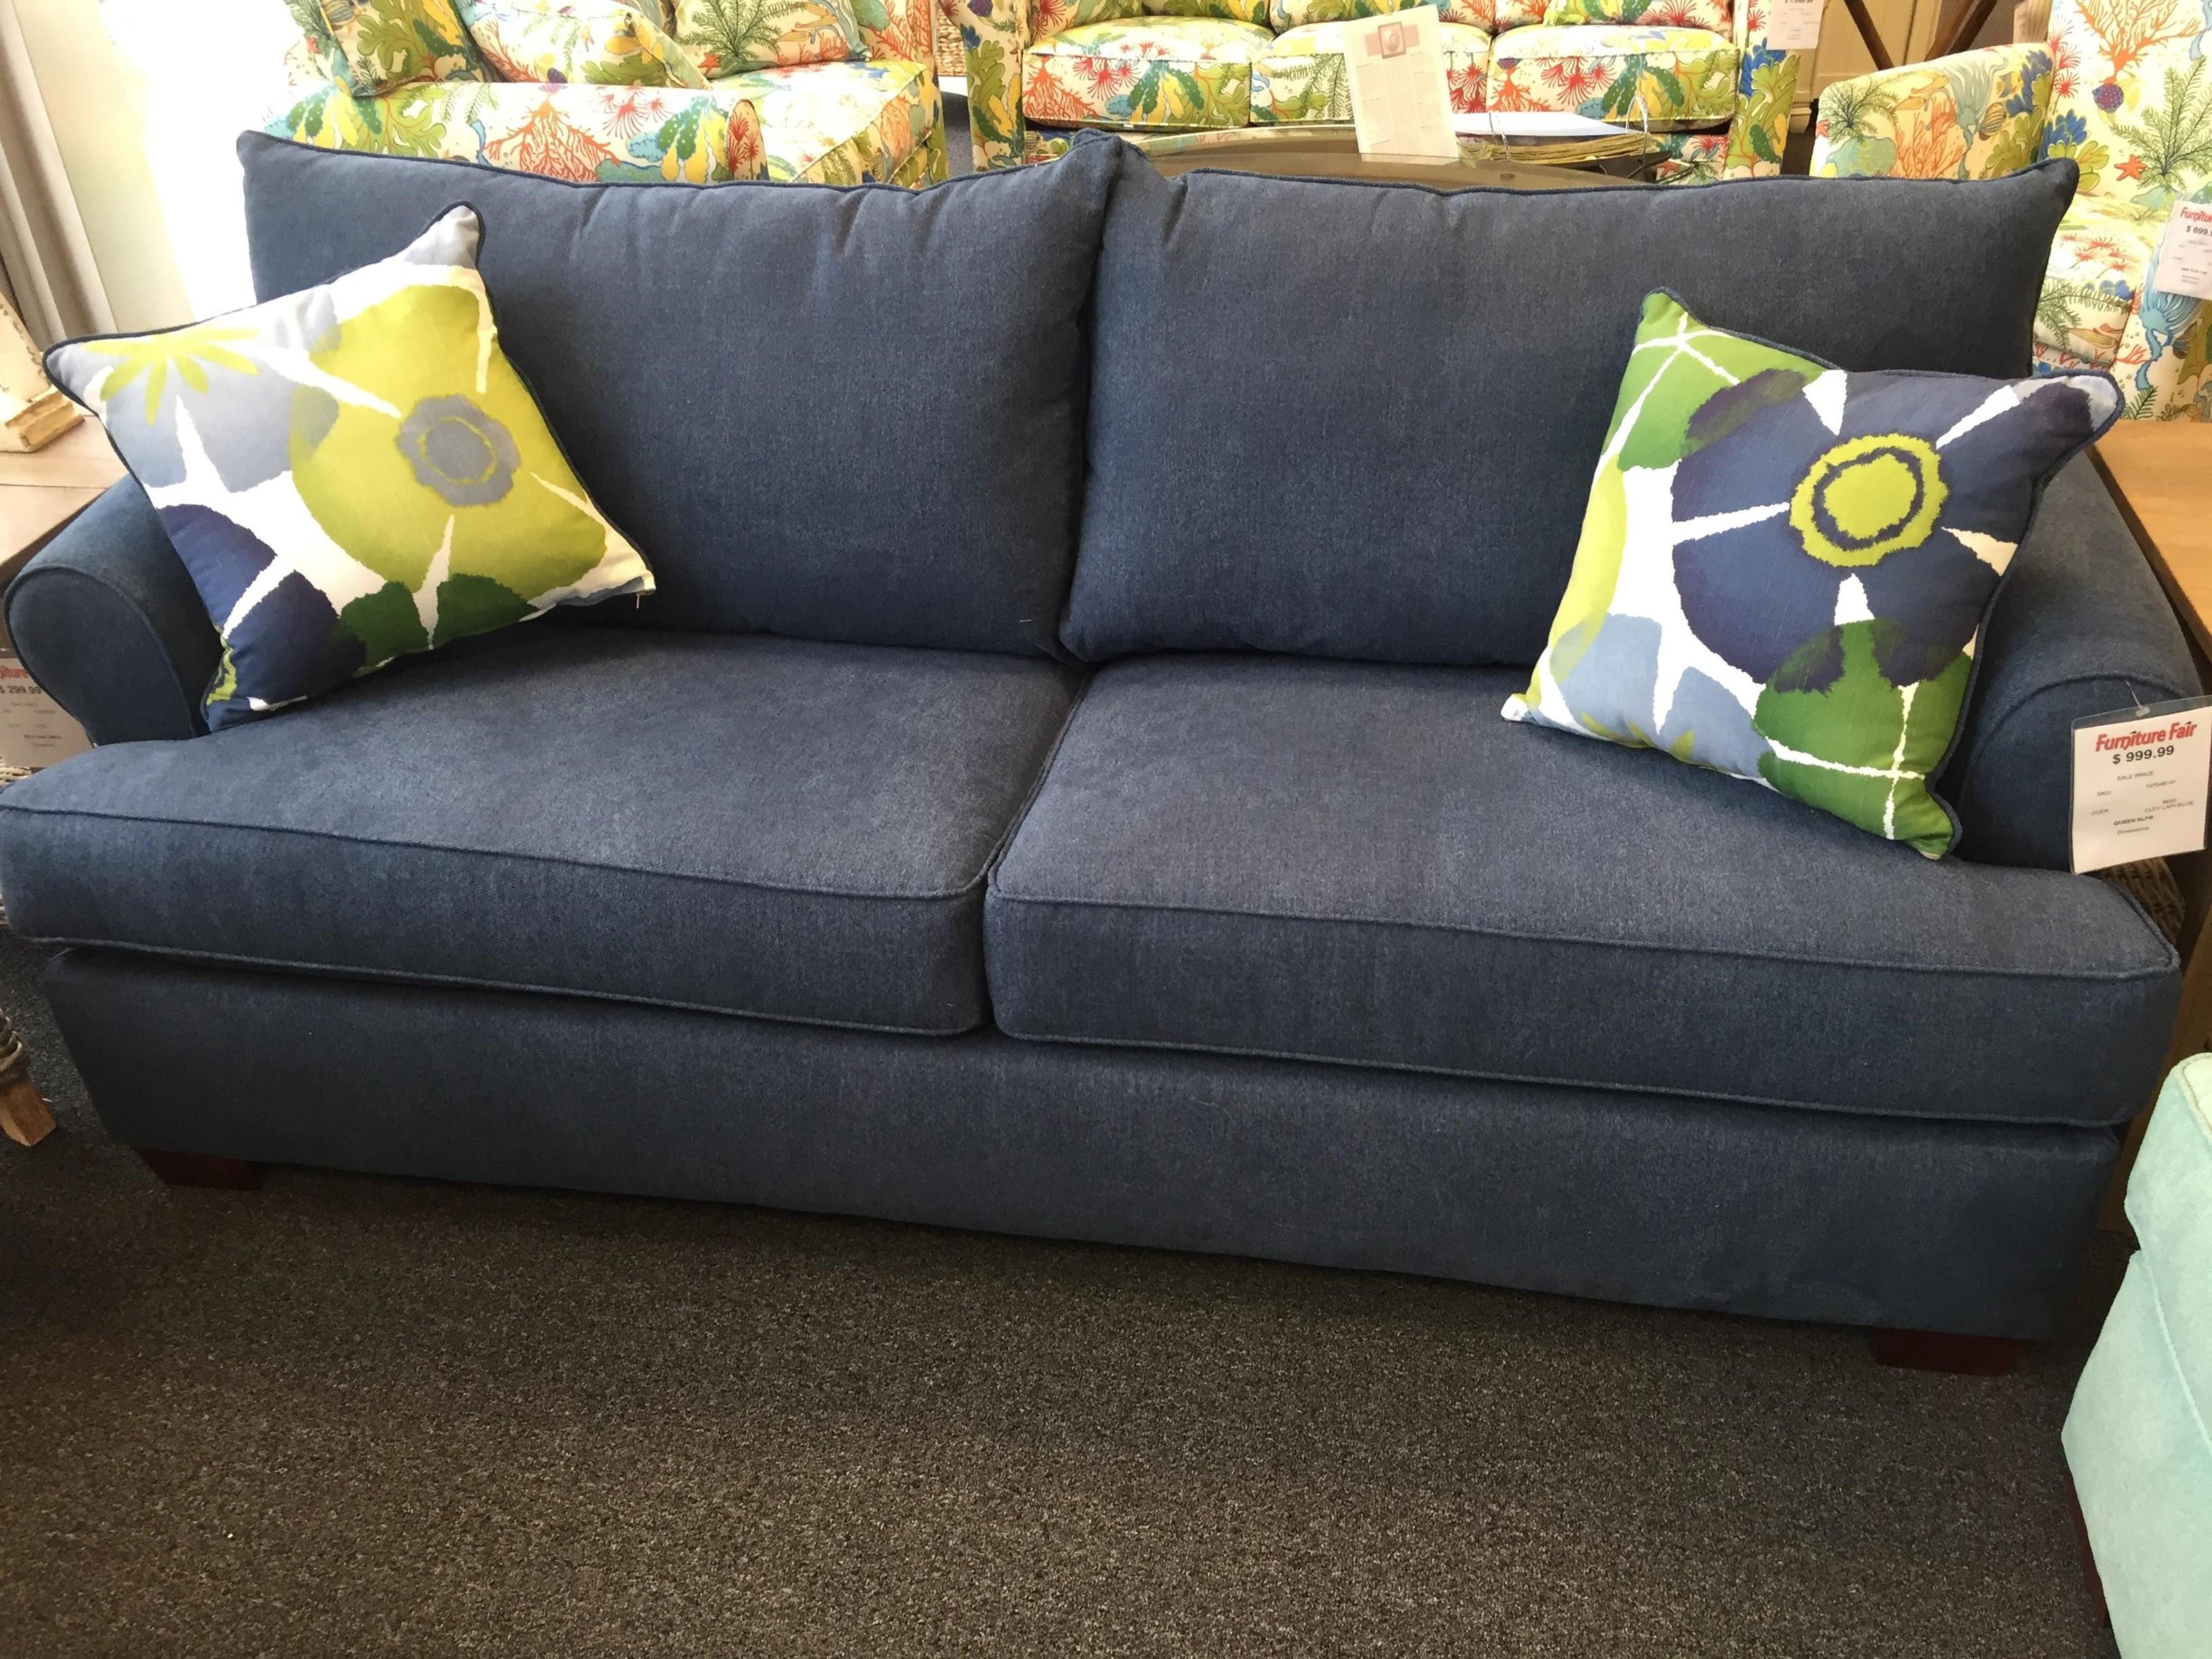 Overnight Sofa 8650 Queen Sleeper Sofa - Item Number: 8650blue